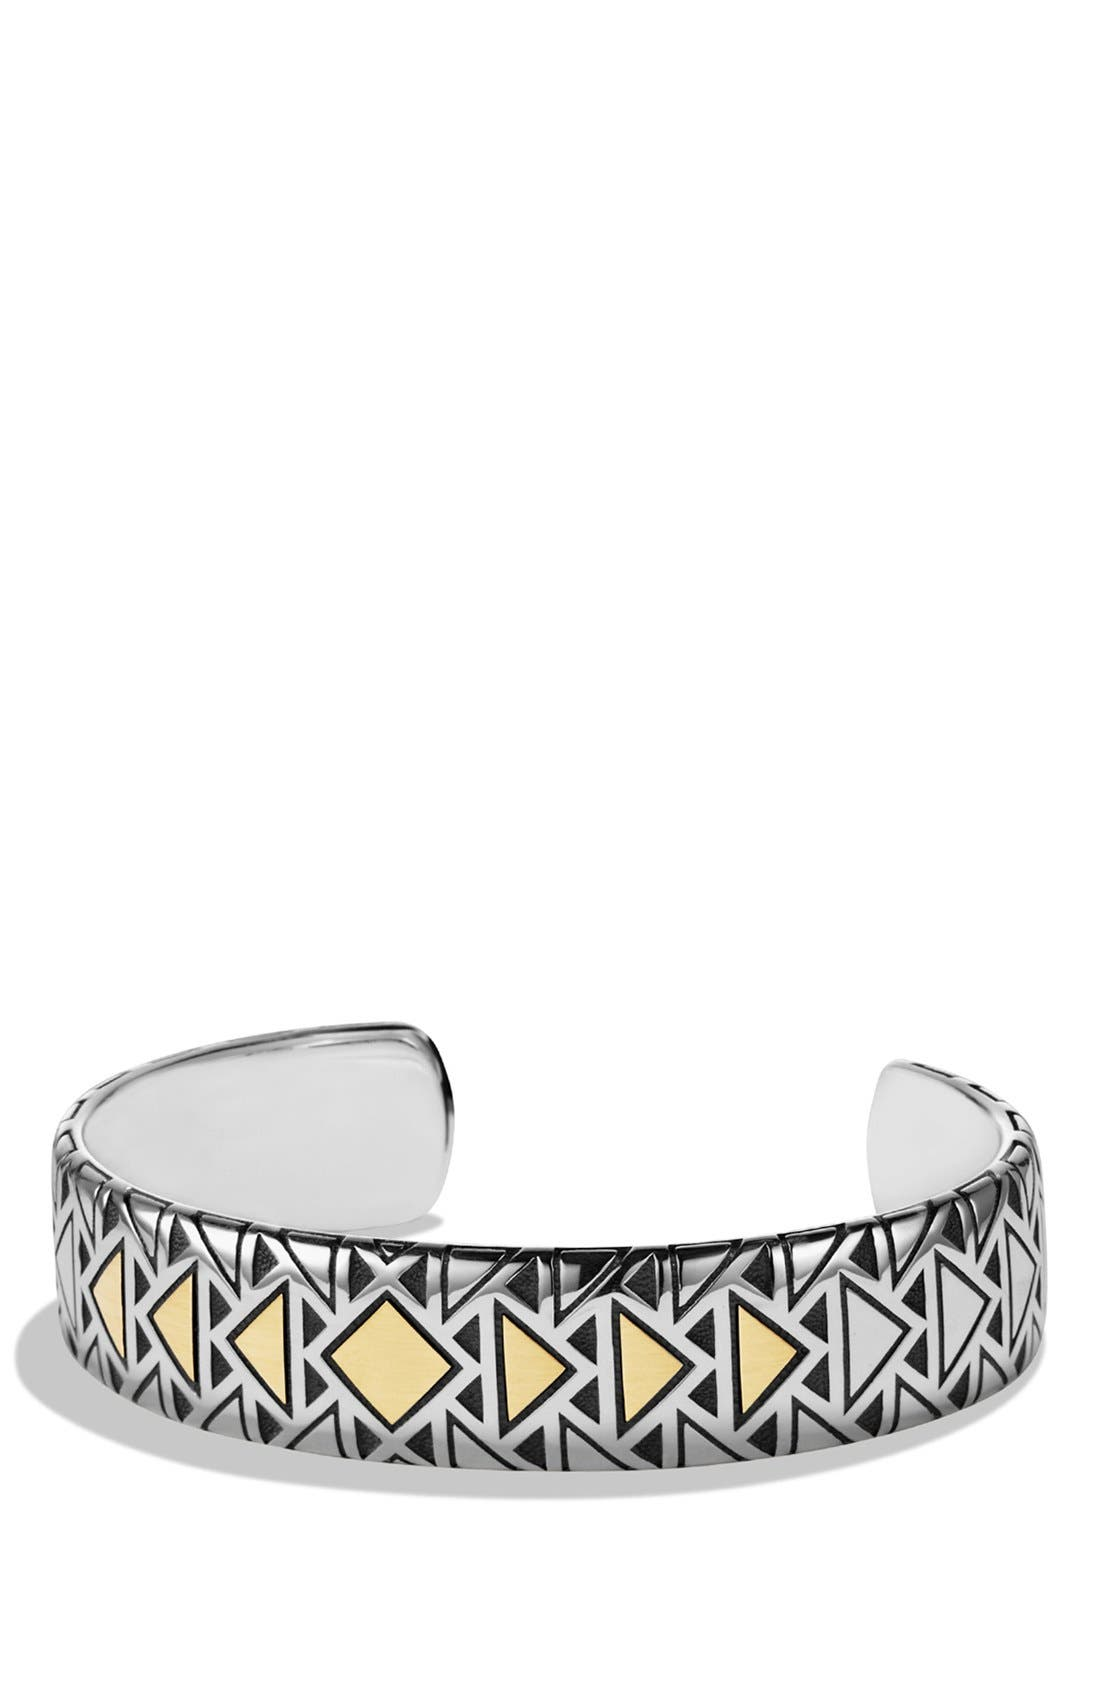 DAVID YURMAN,                             Southwest Cuff Bracelet with 18K Gold,                             Main thumbnail 1, color,                             040